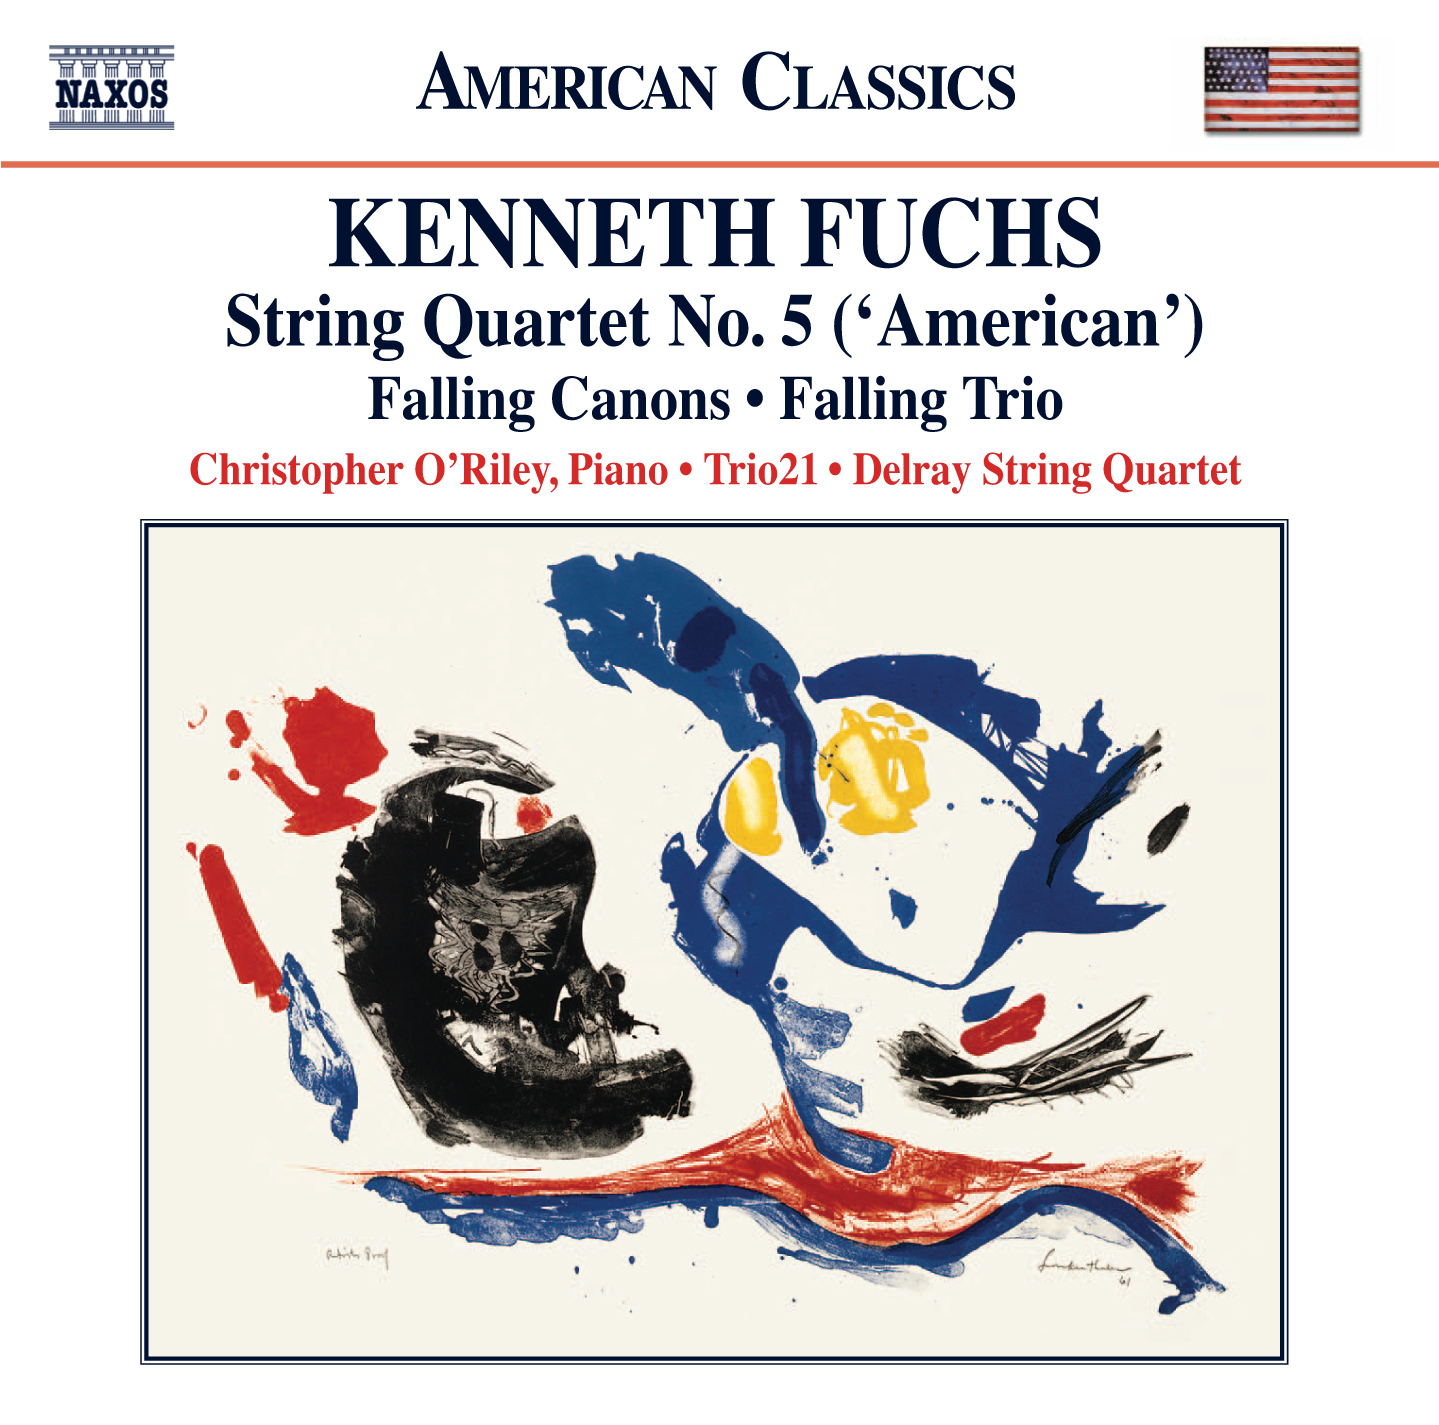 Fuchs:  String Quartet No. 5, 'American' - Falling Canons - Falling Trio